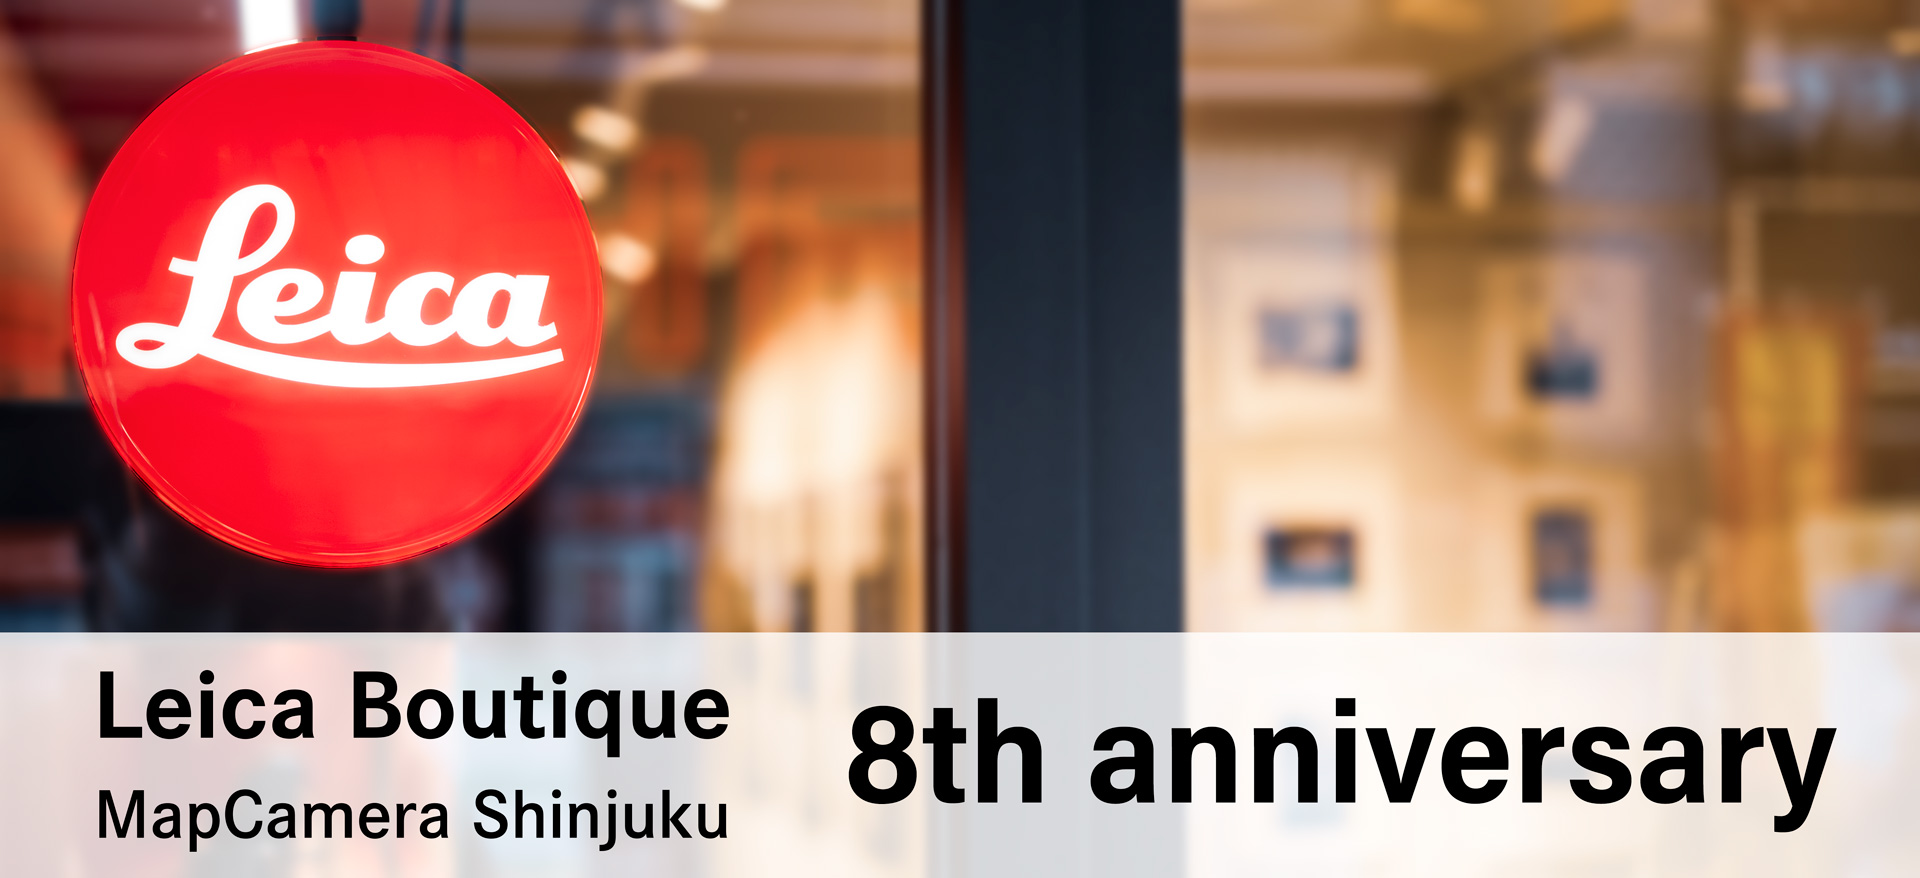 LEICA Boutique ~MapCamera Shinjuku~ 8th Anniv.